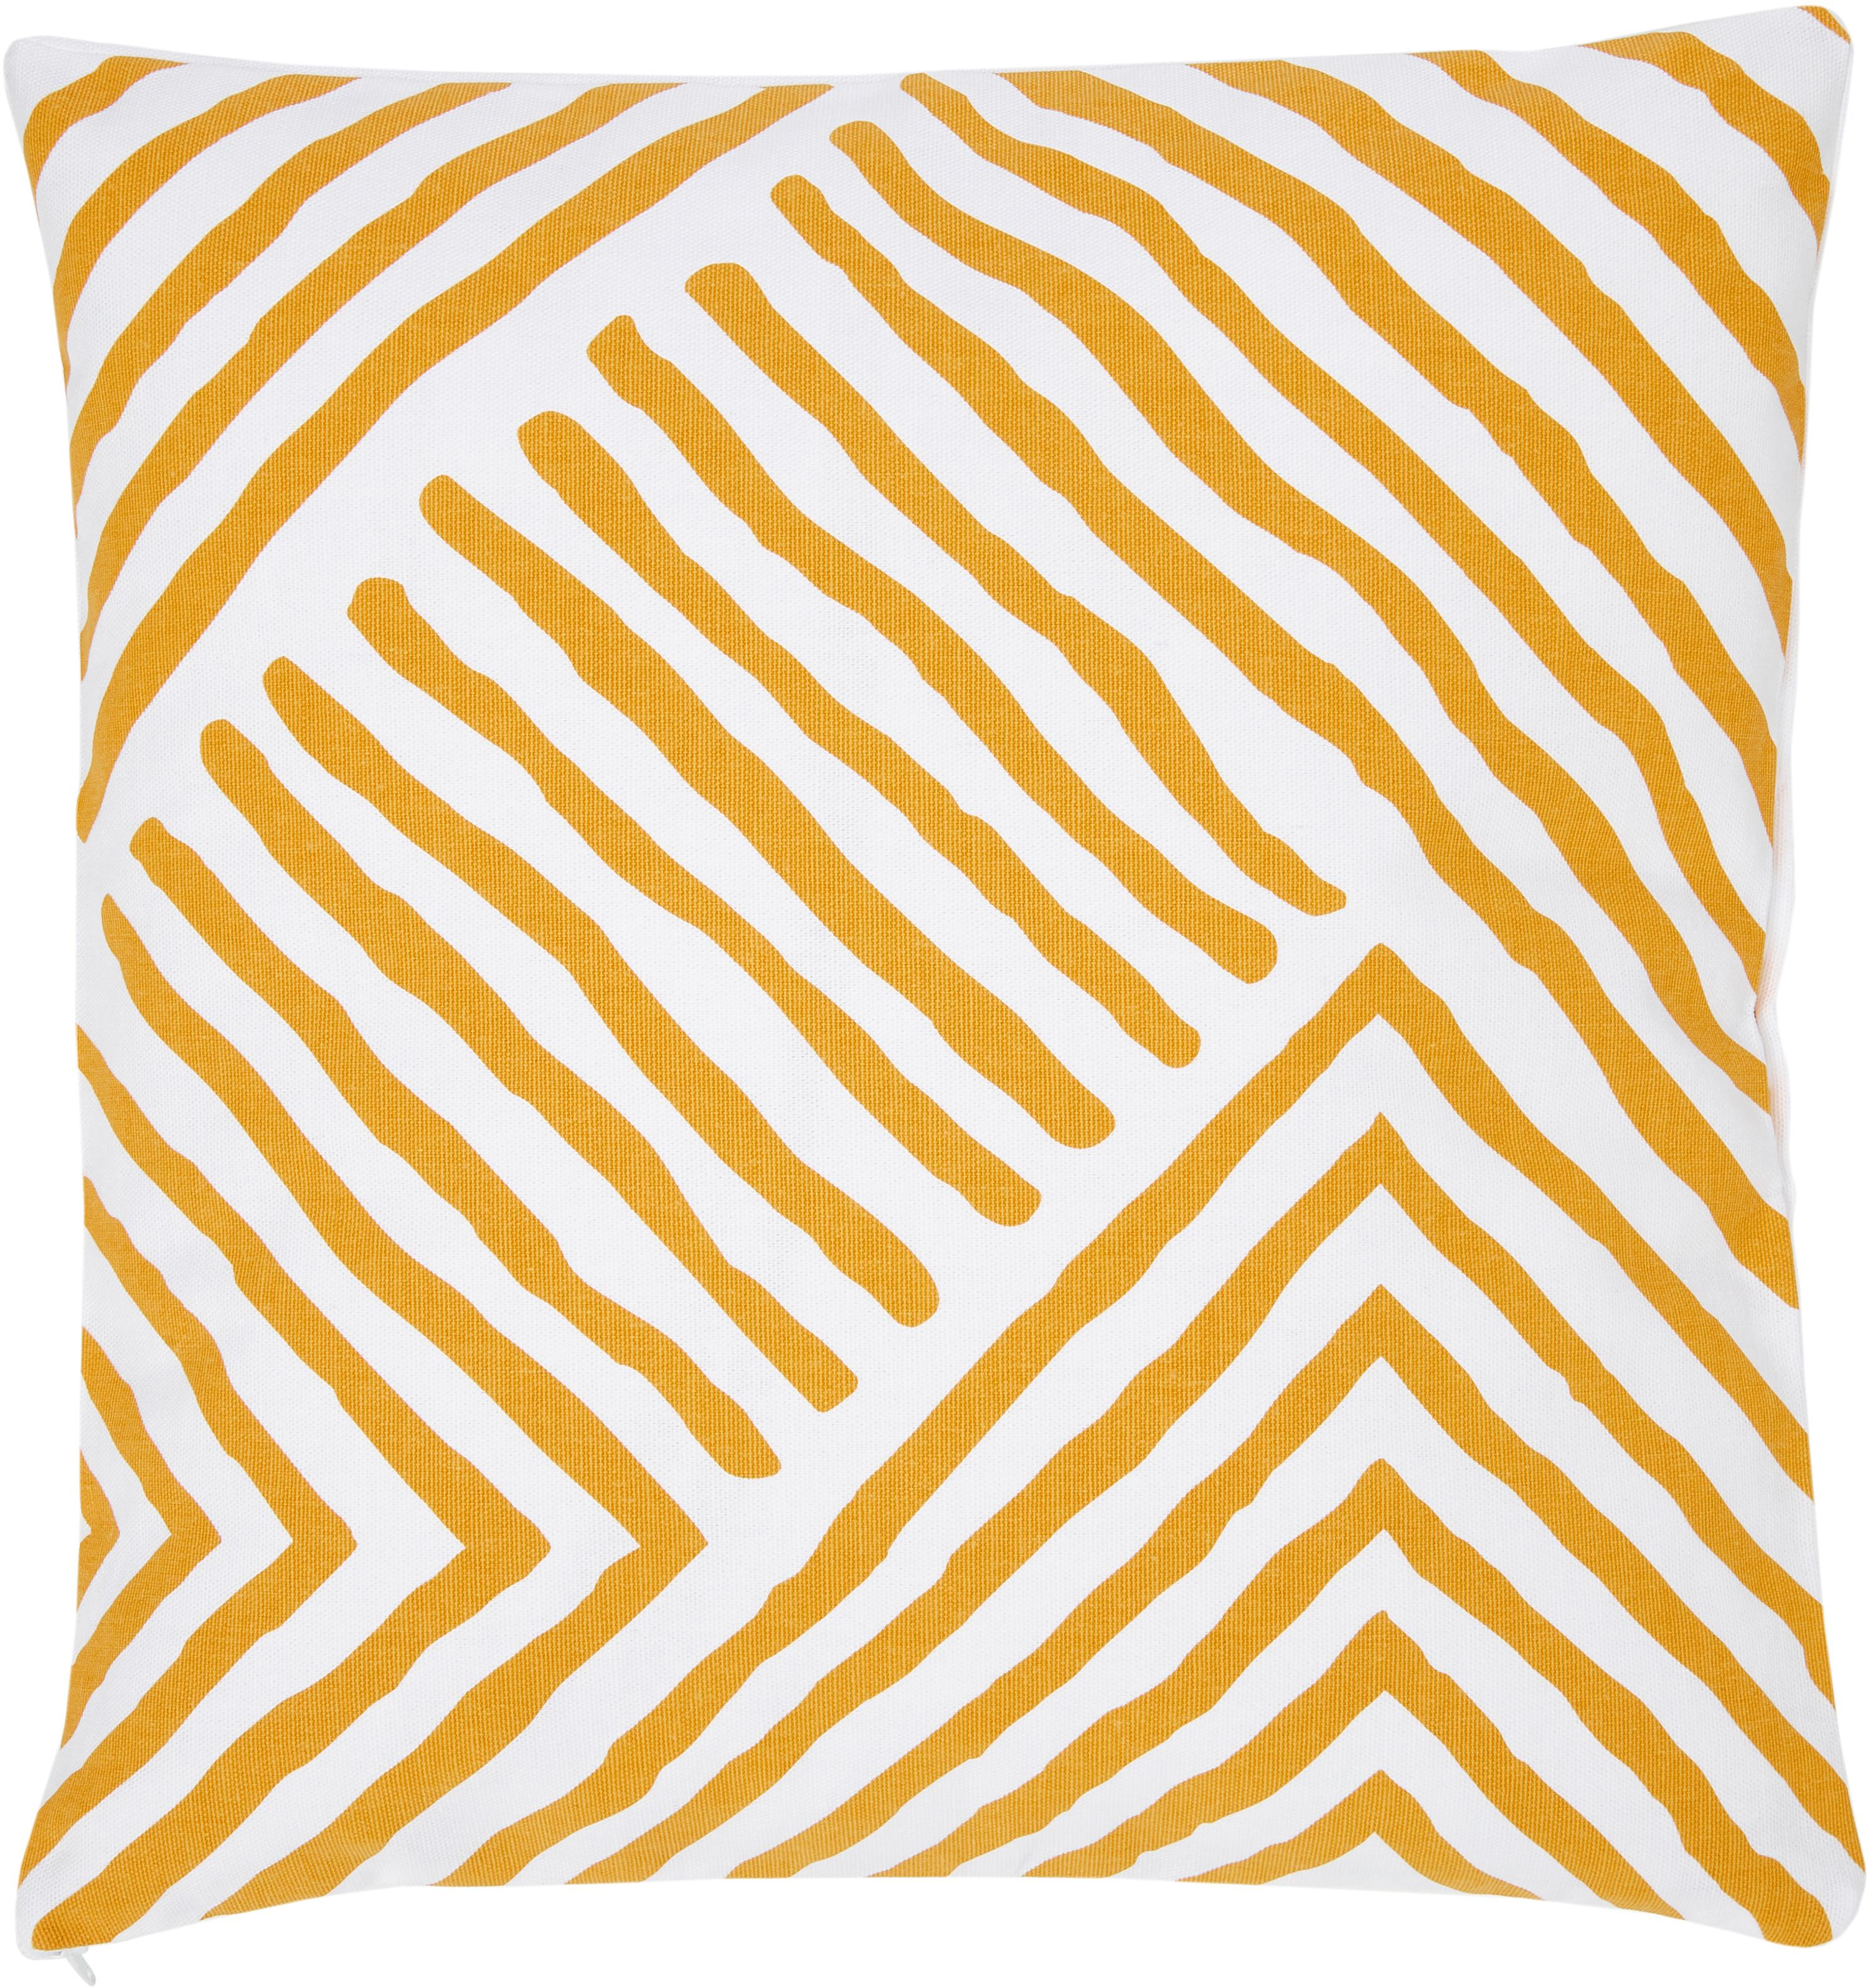 Gemusterte Kissenhülle Mia, 100% Baumwolle, Gelb-Orange, Weiß, 40 x 40 cm